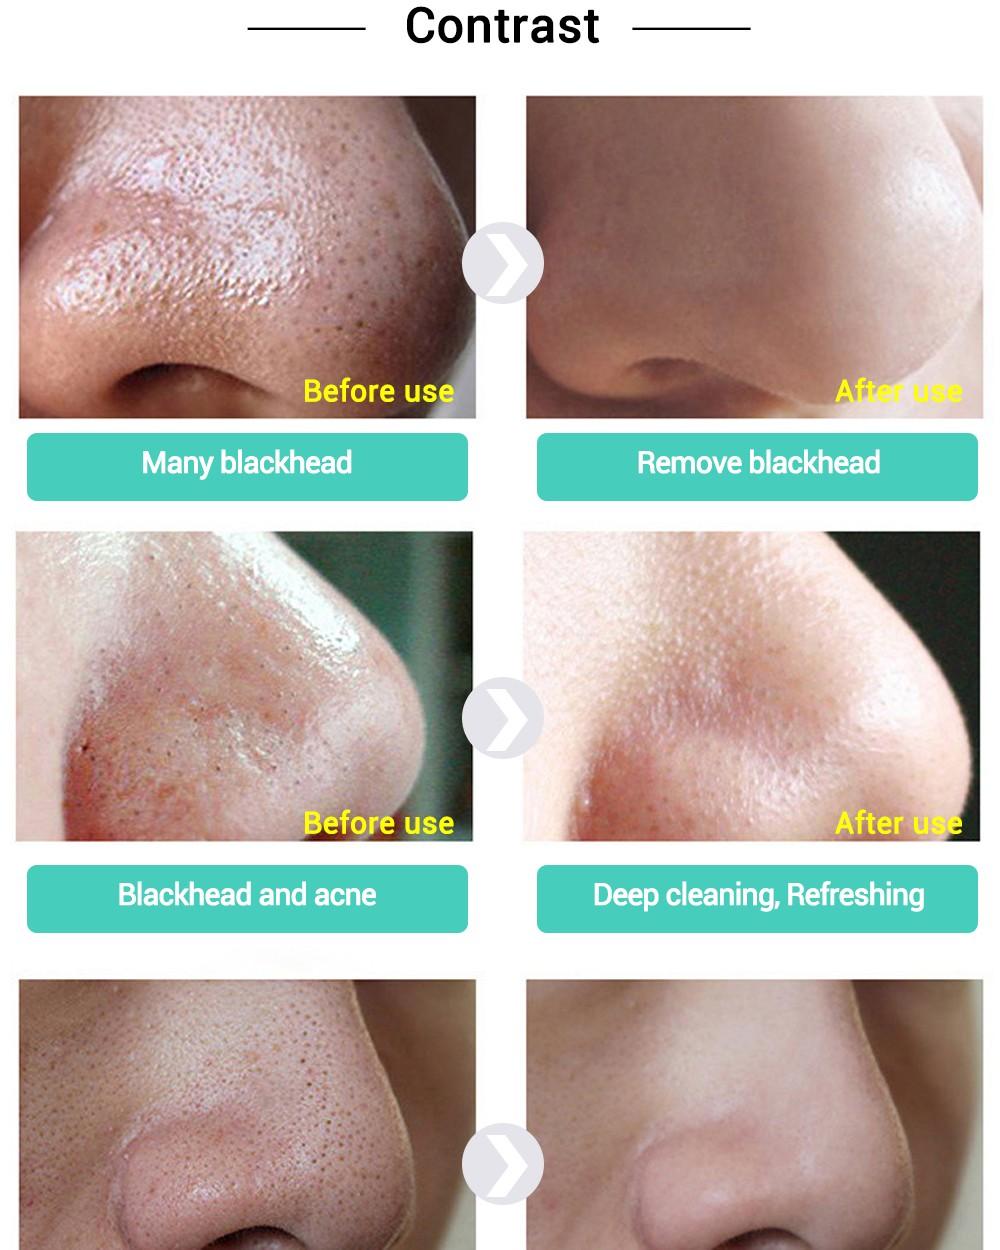 2017 New Style LANBENA Blackhead Remover Nose Mask Pore Strip Black Mask Peeling Acne Treatment Black Deep Cleansing Skin Care